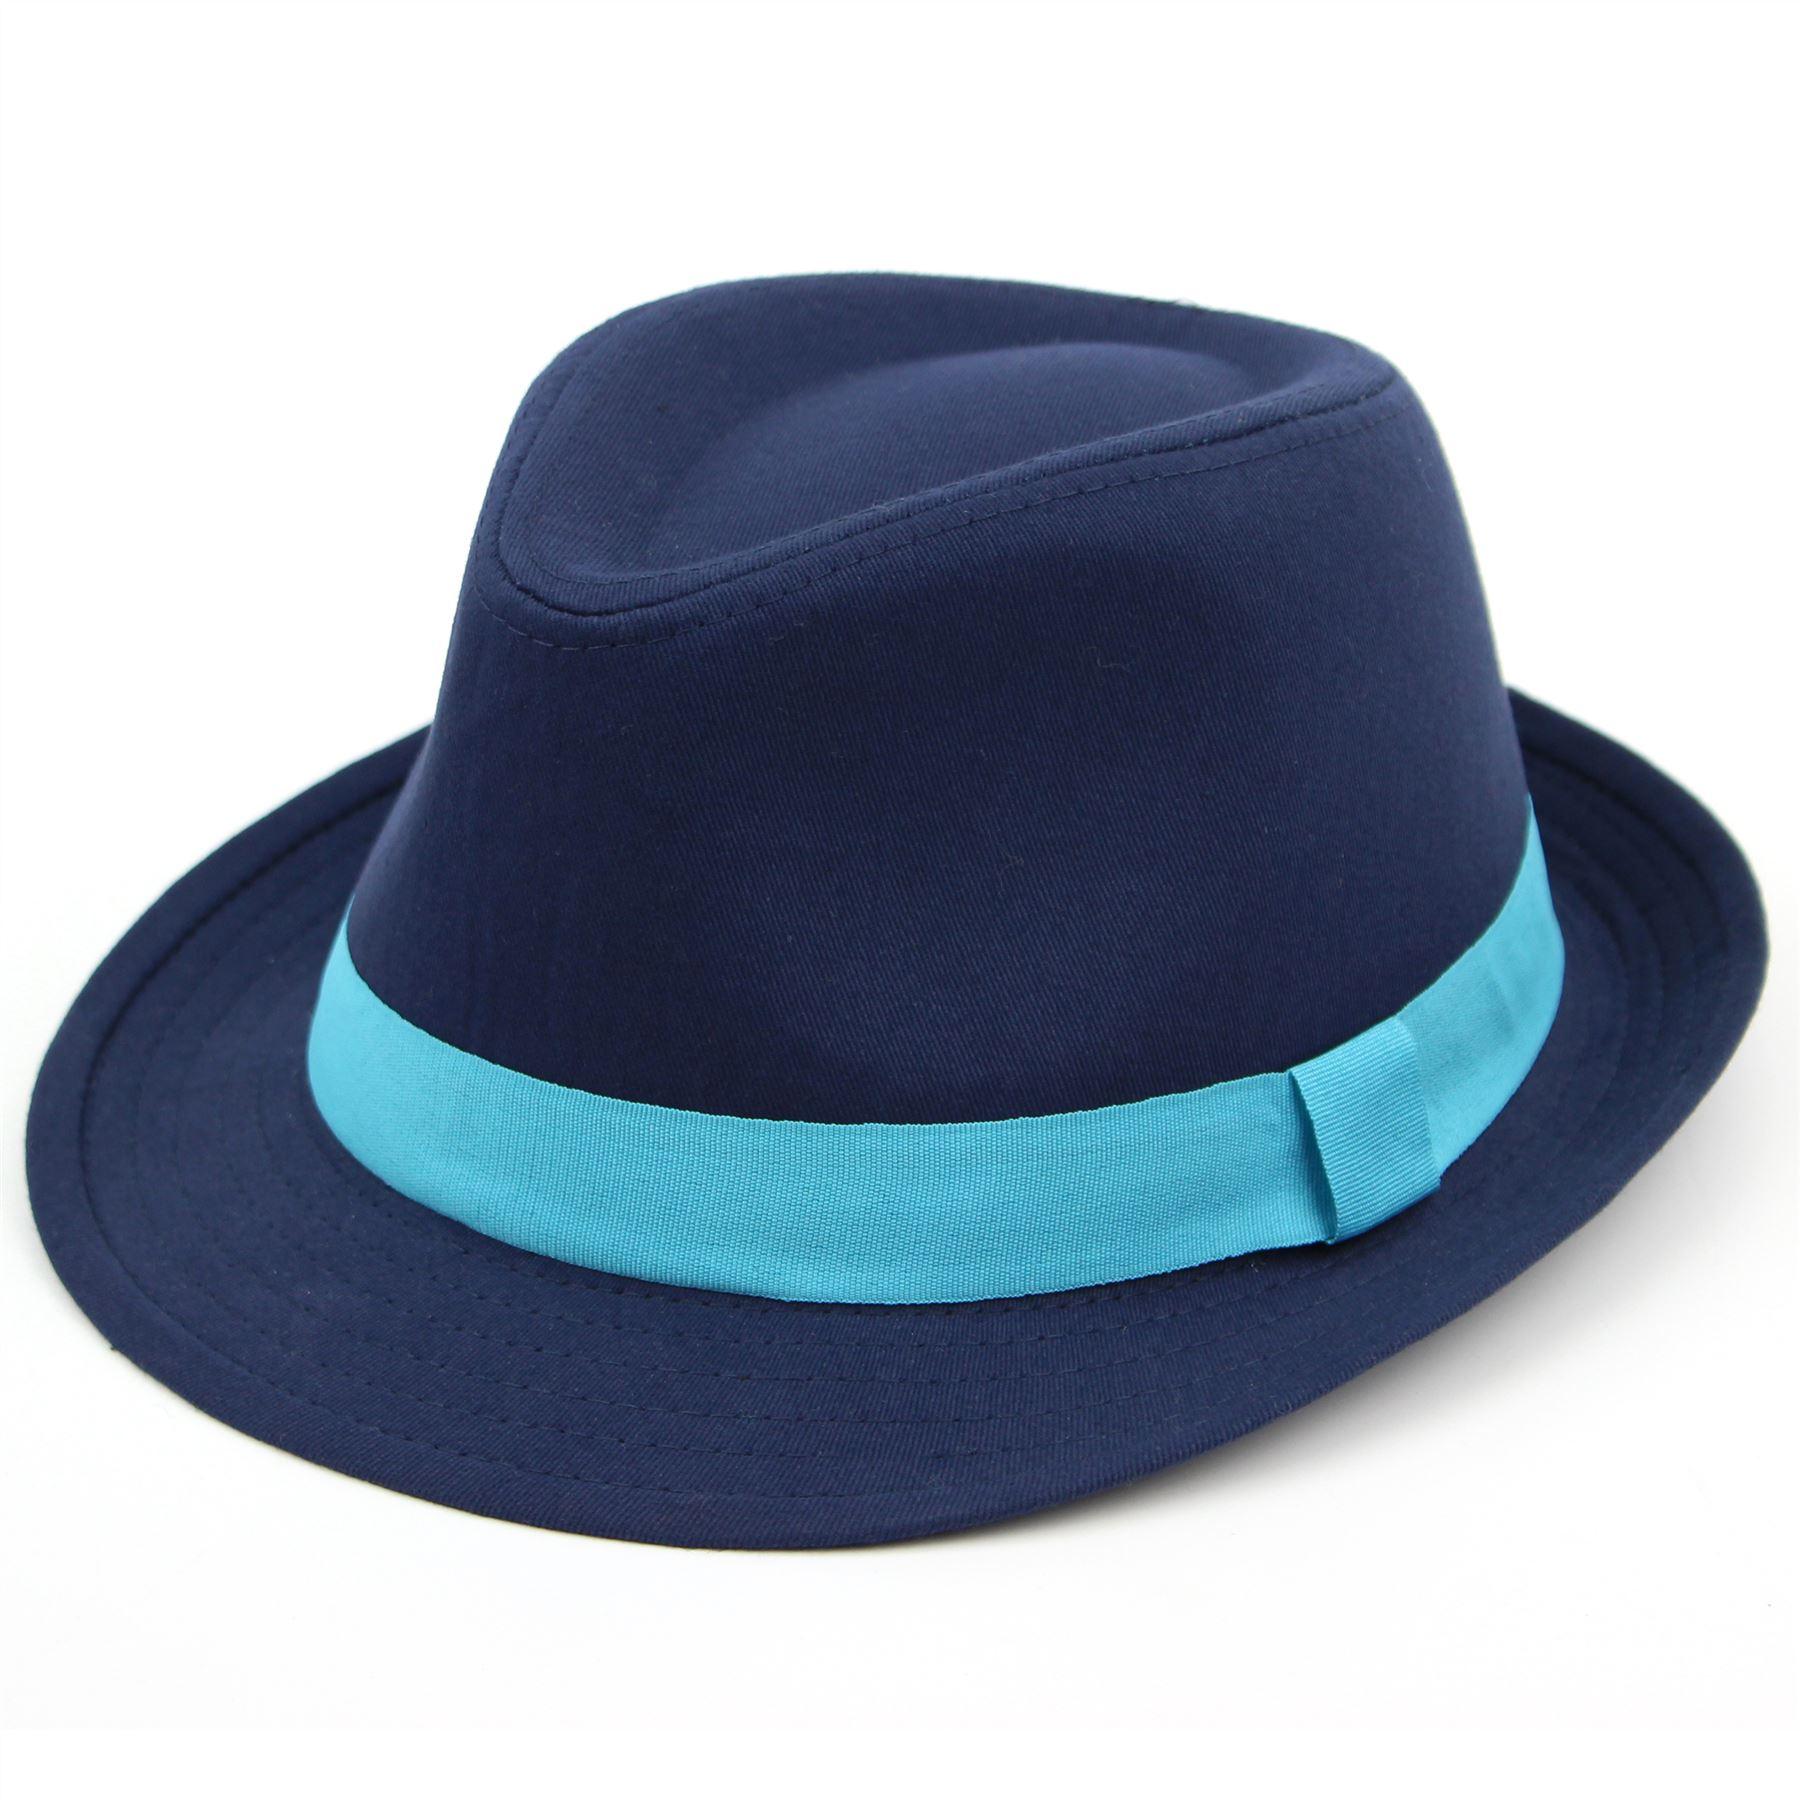 Deep Blue Wool Felt Fedora - Pure Wool Felt Handmade ...  |Blue Black Band Fedora